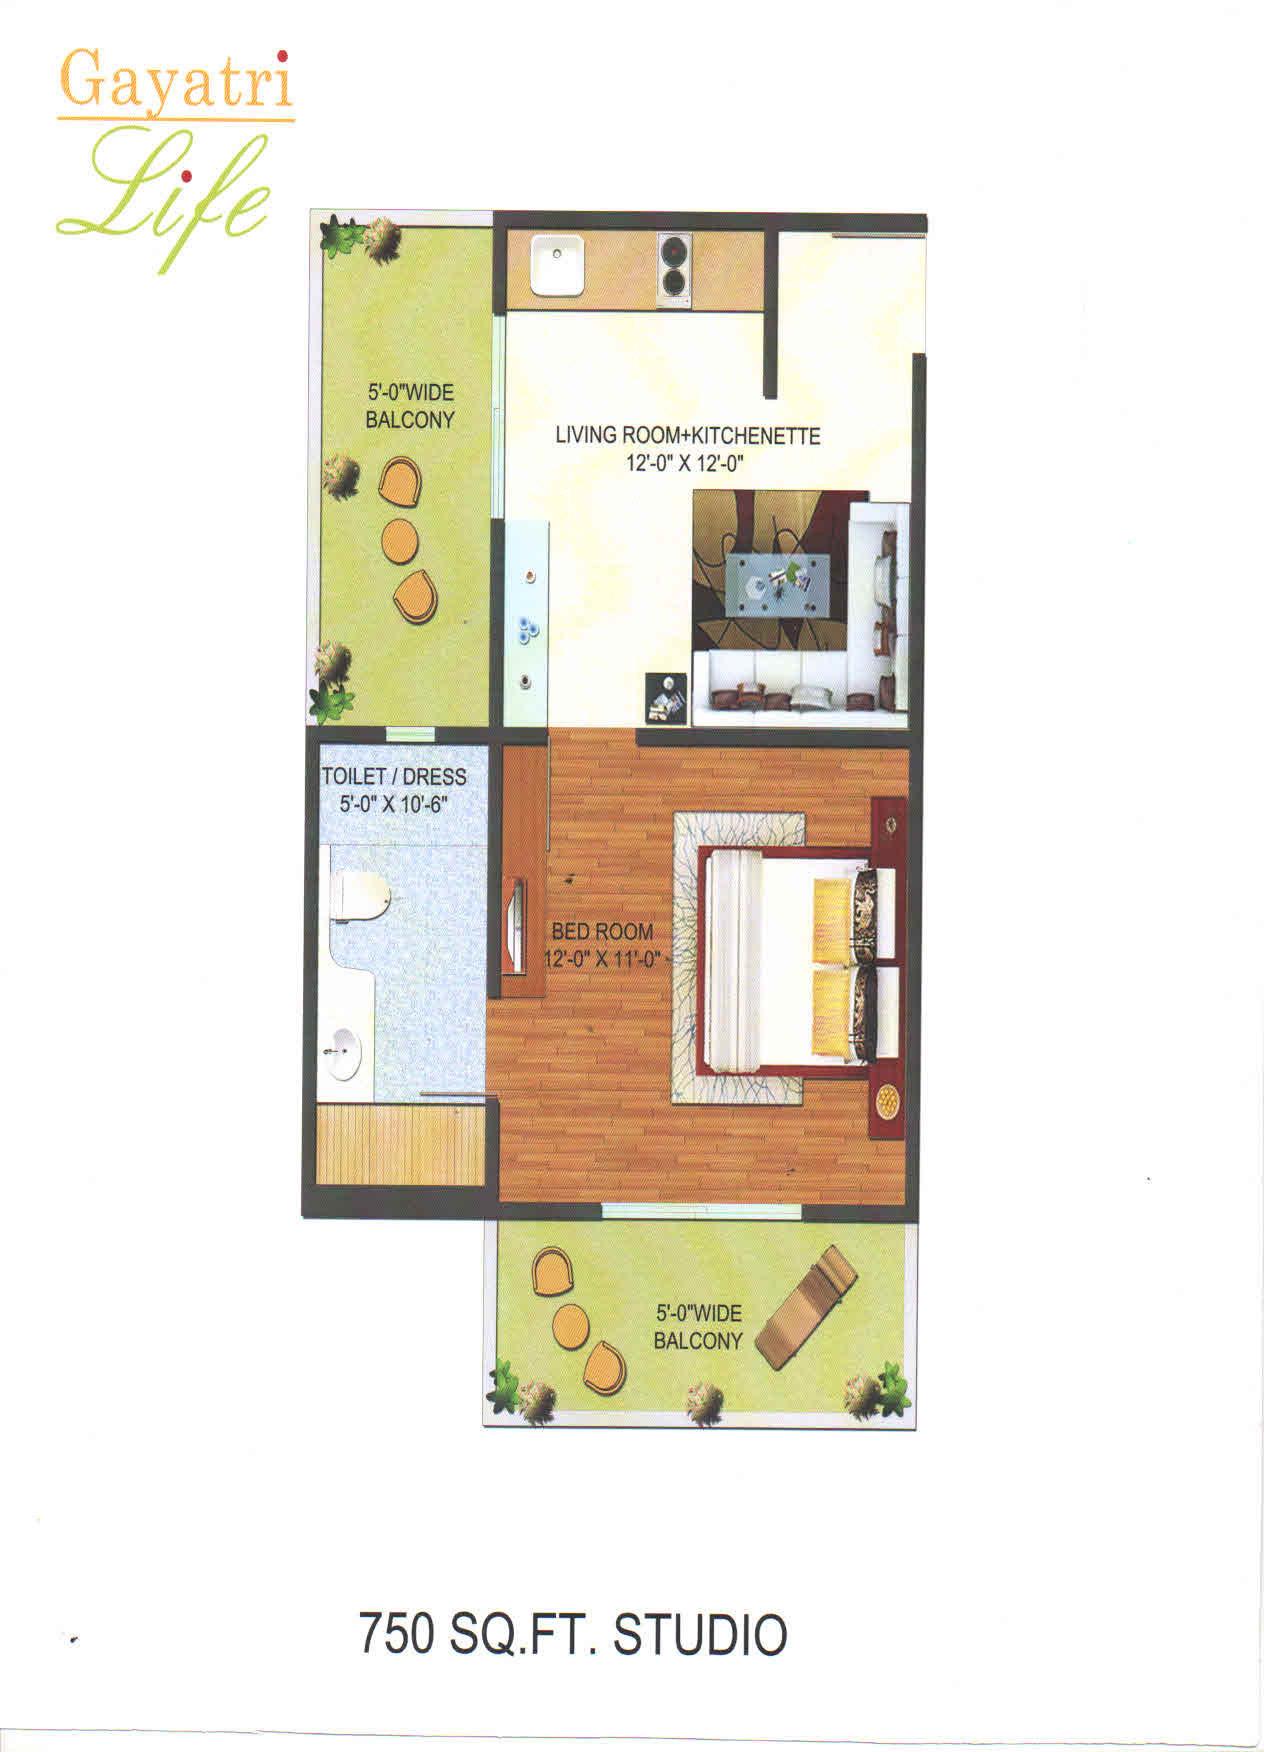 gayatri life floor plan2